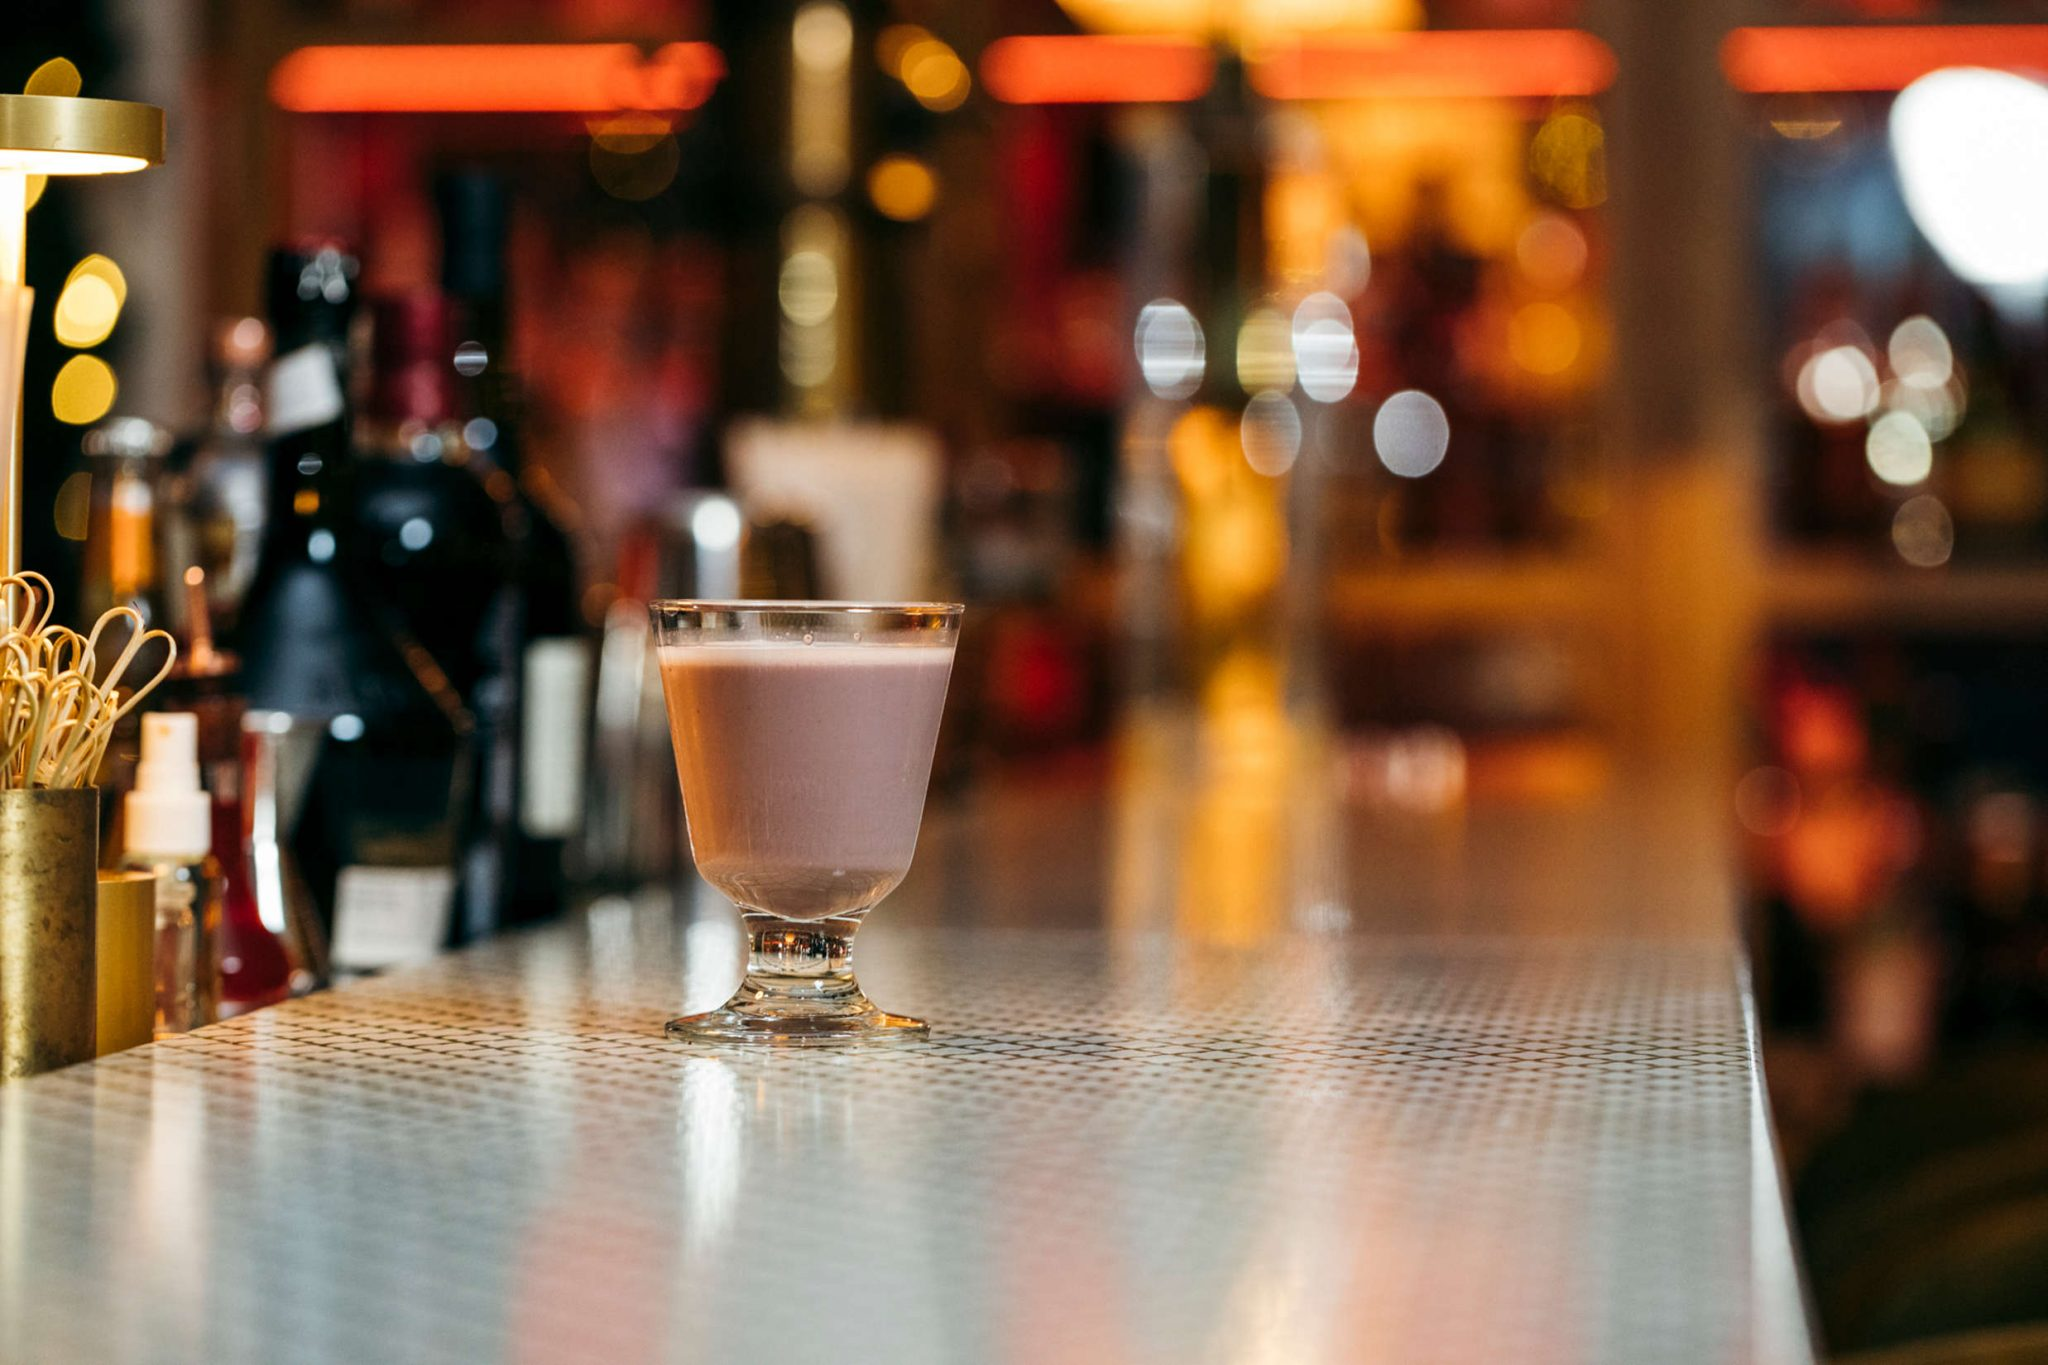 cocktail singleton and port flip